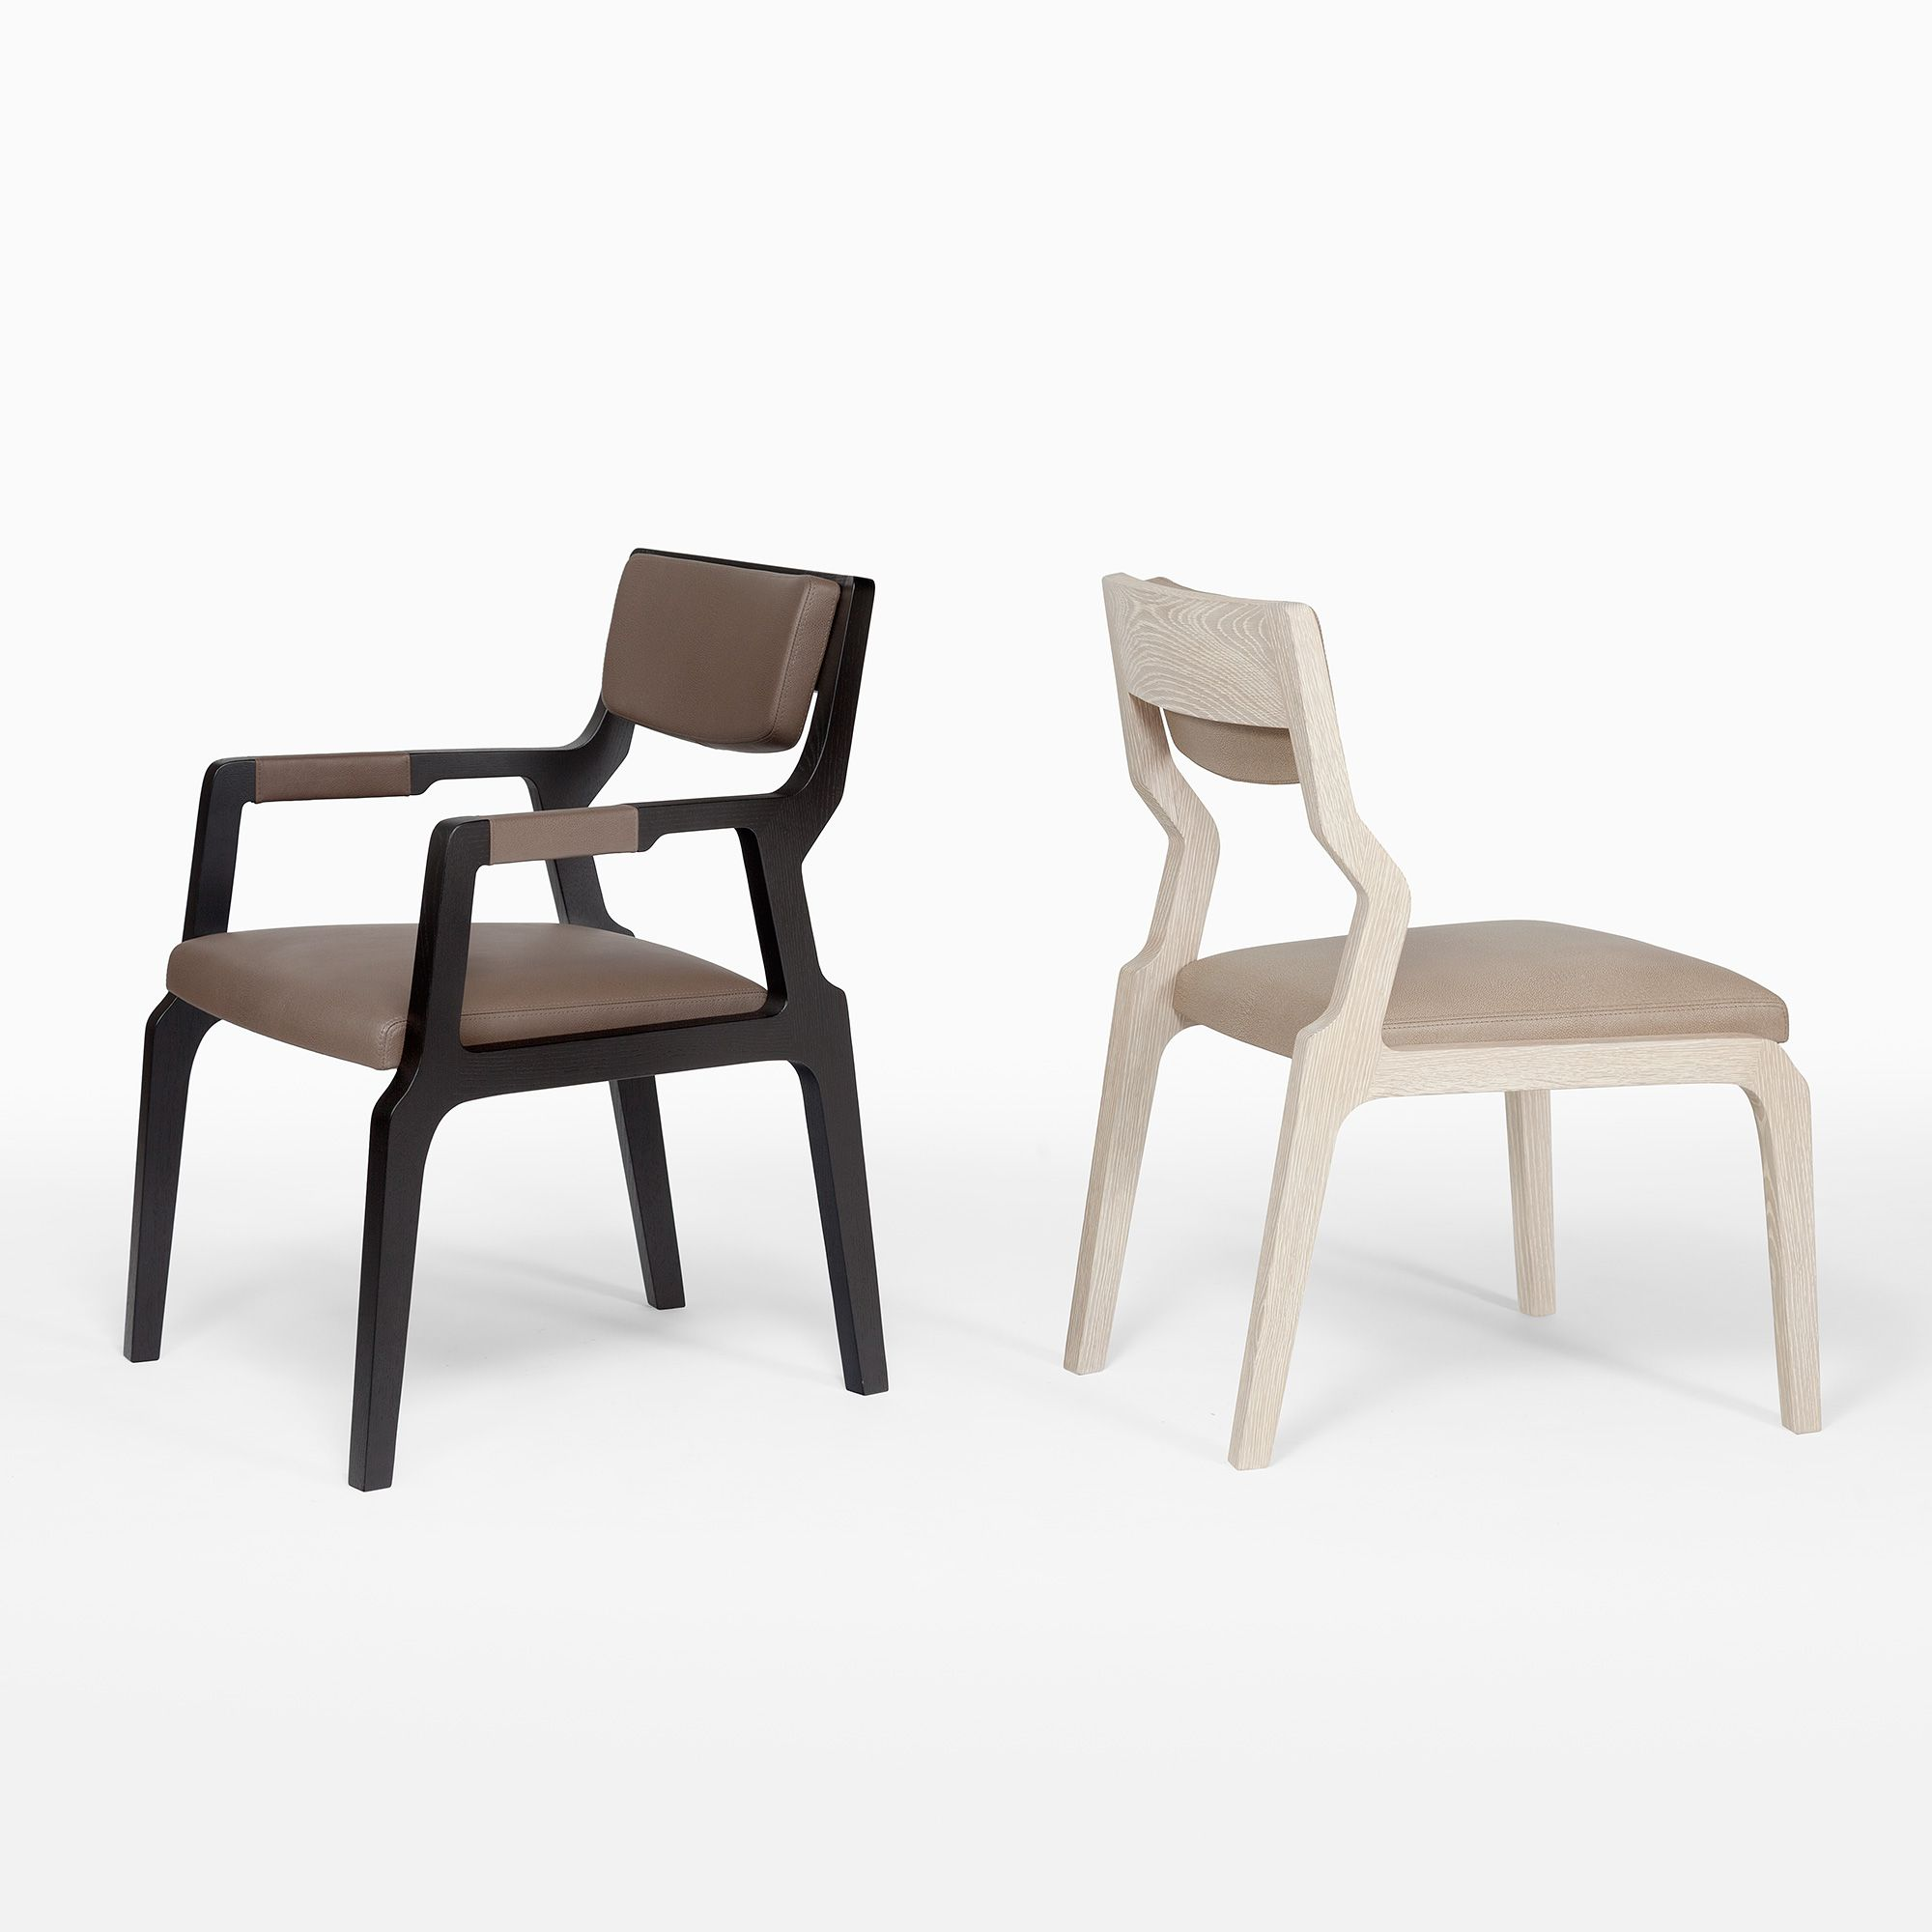 Blaine Dining Side Chair - CASTE Design